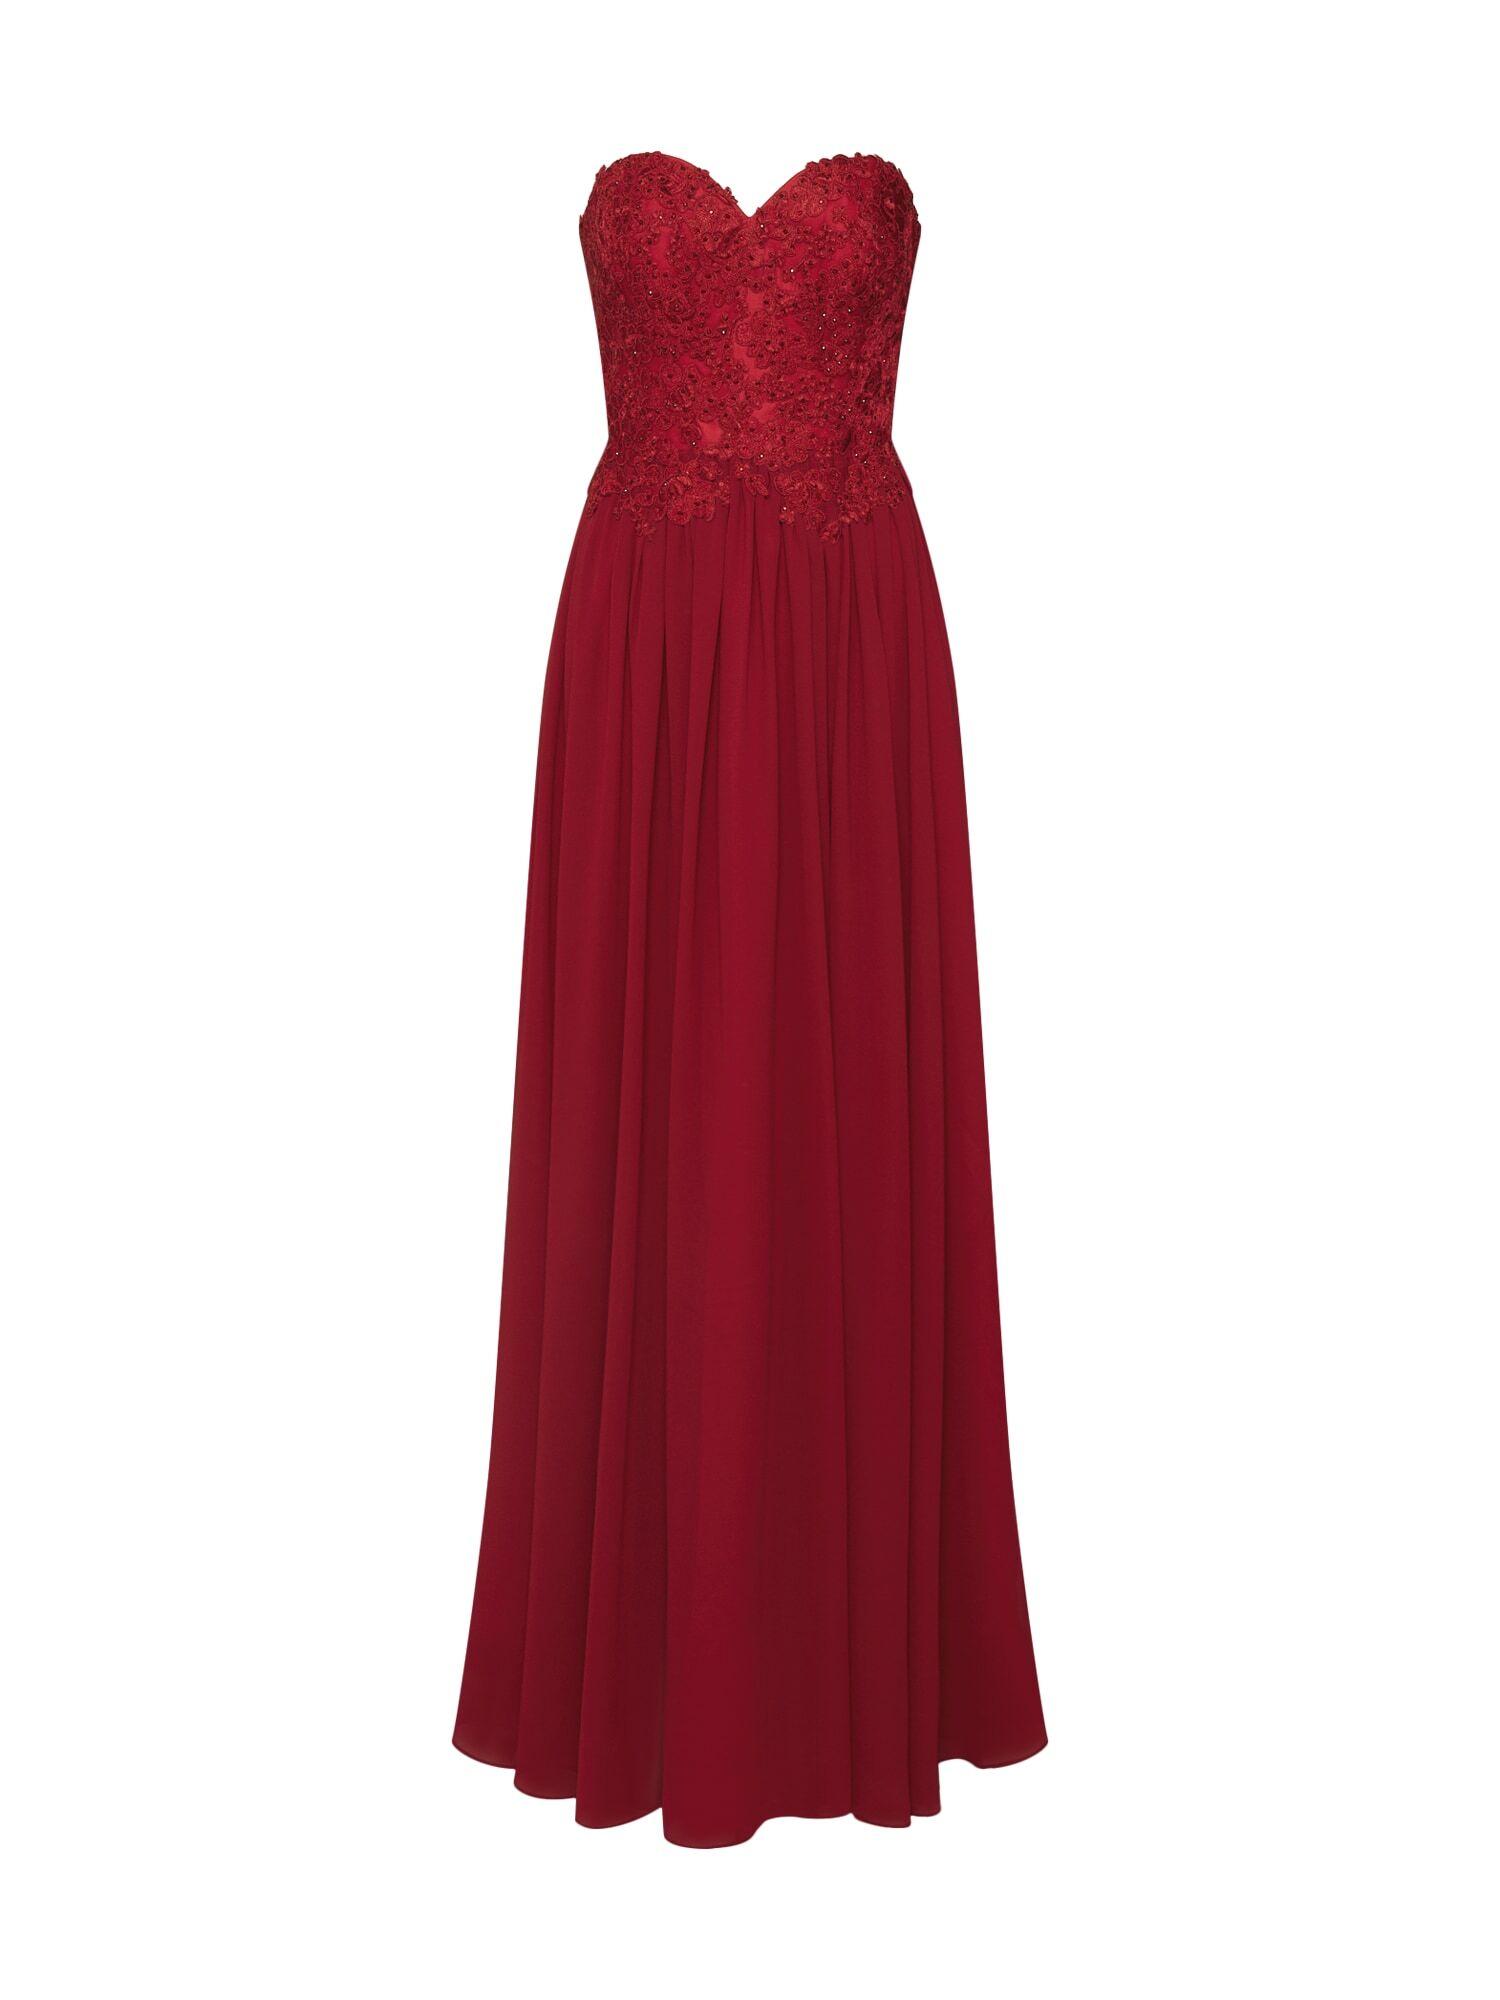 mascara Robe de soirée  - Rouge - Taille: 42 - female